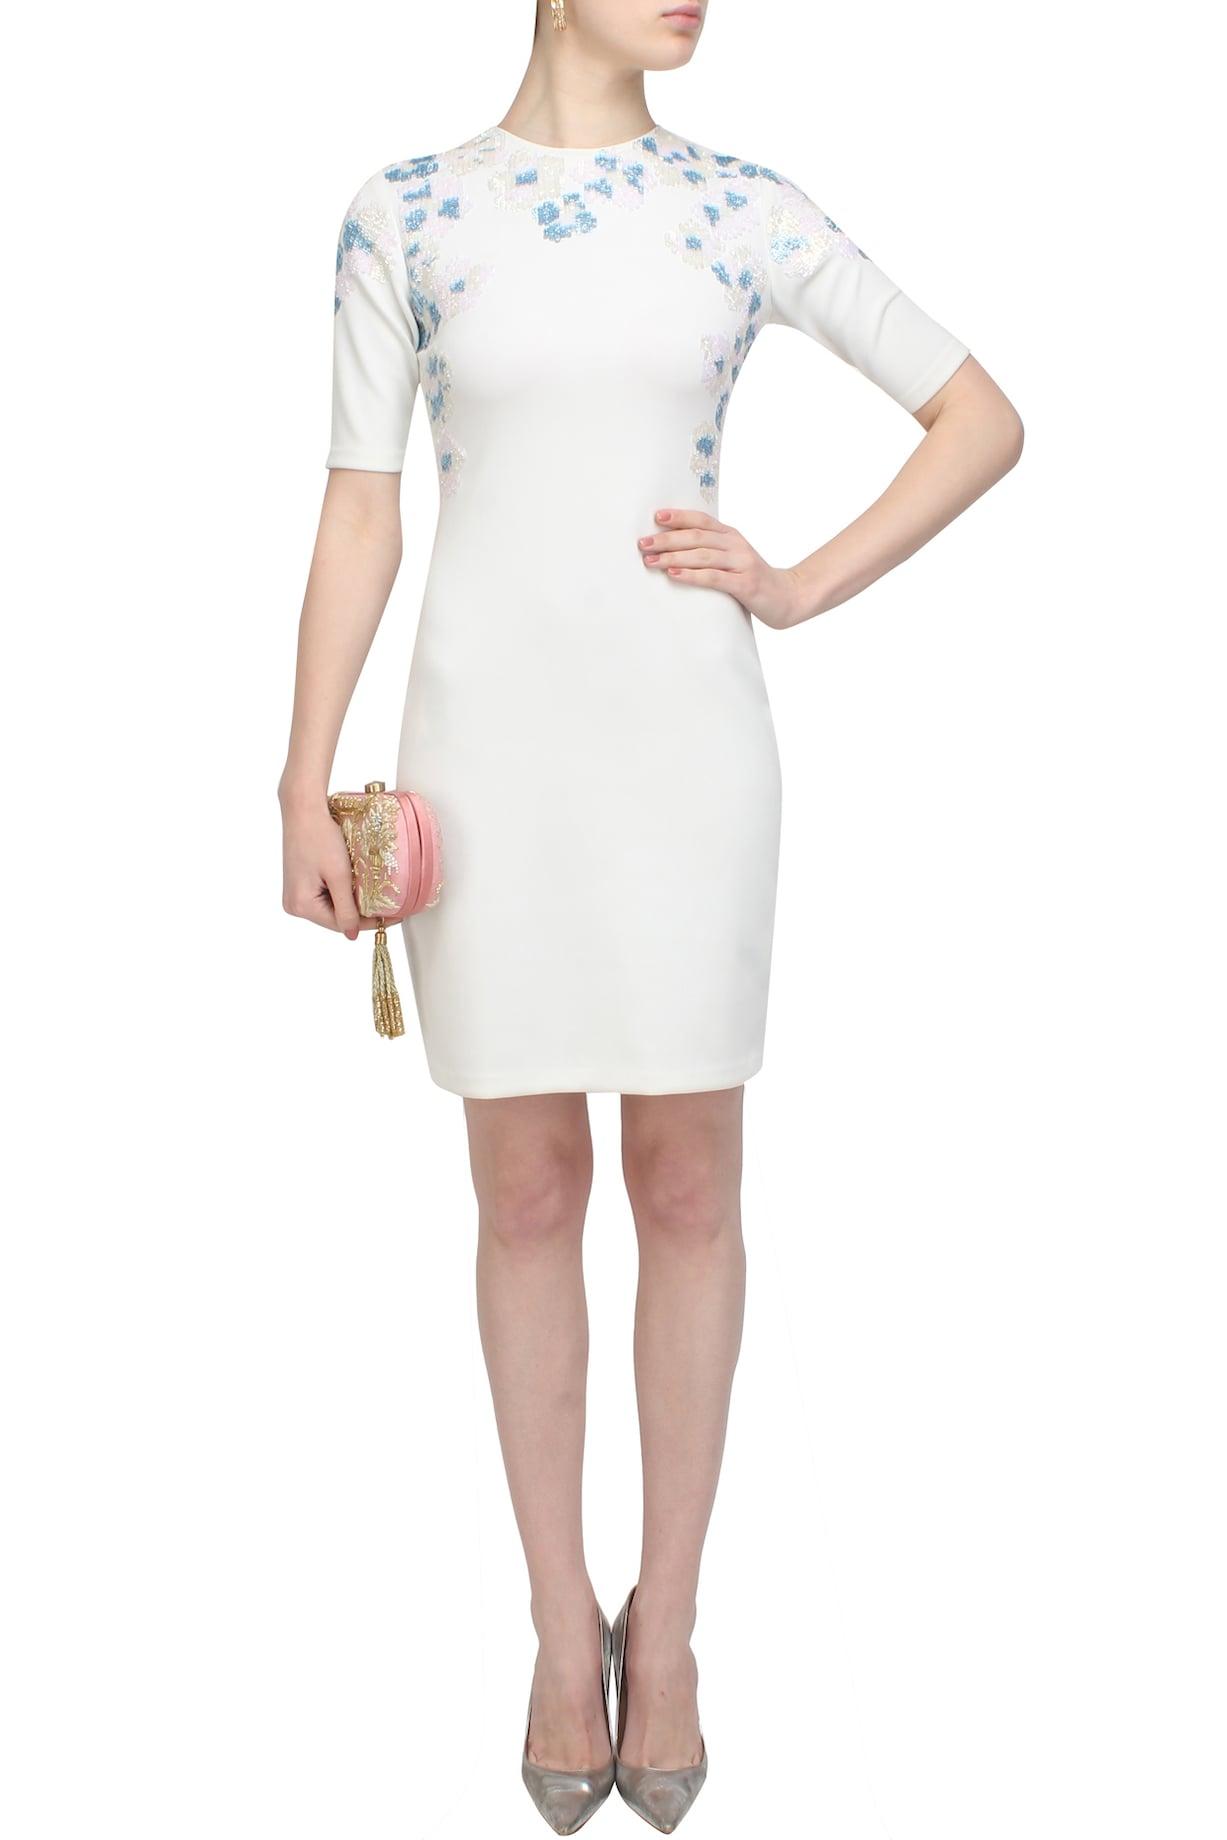 Namrata Joshipura Dresses